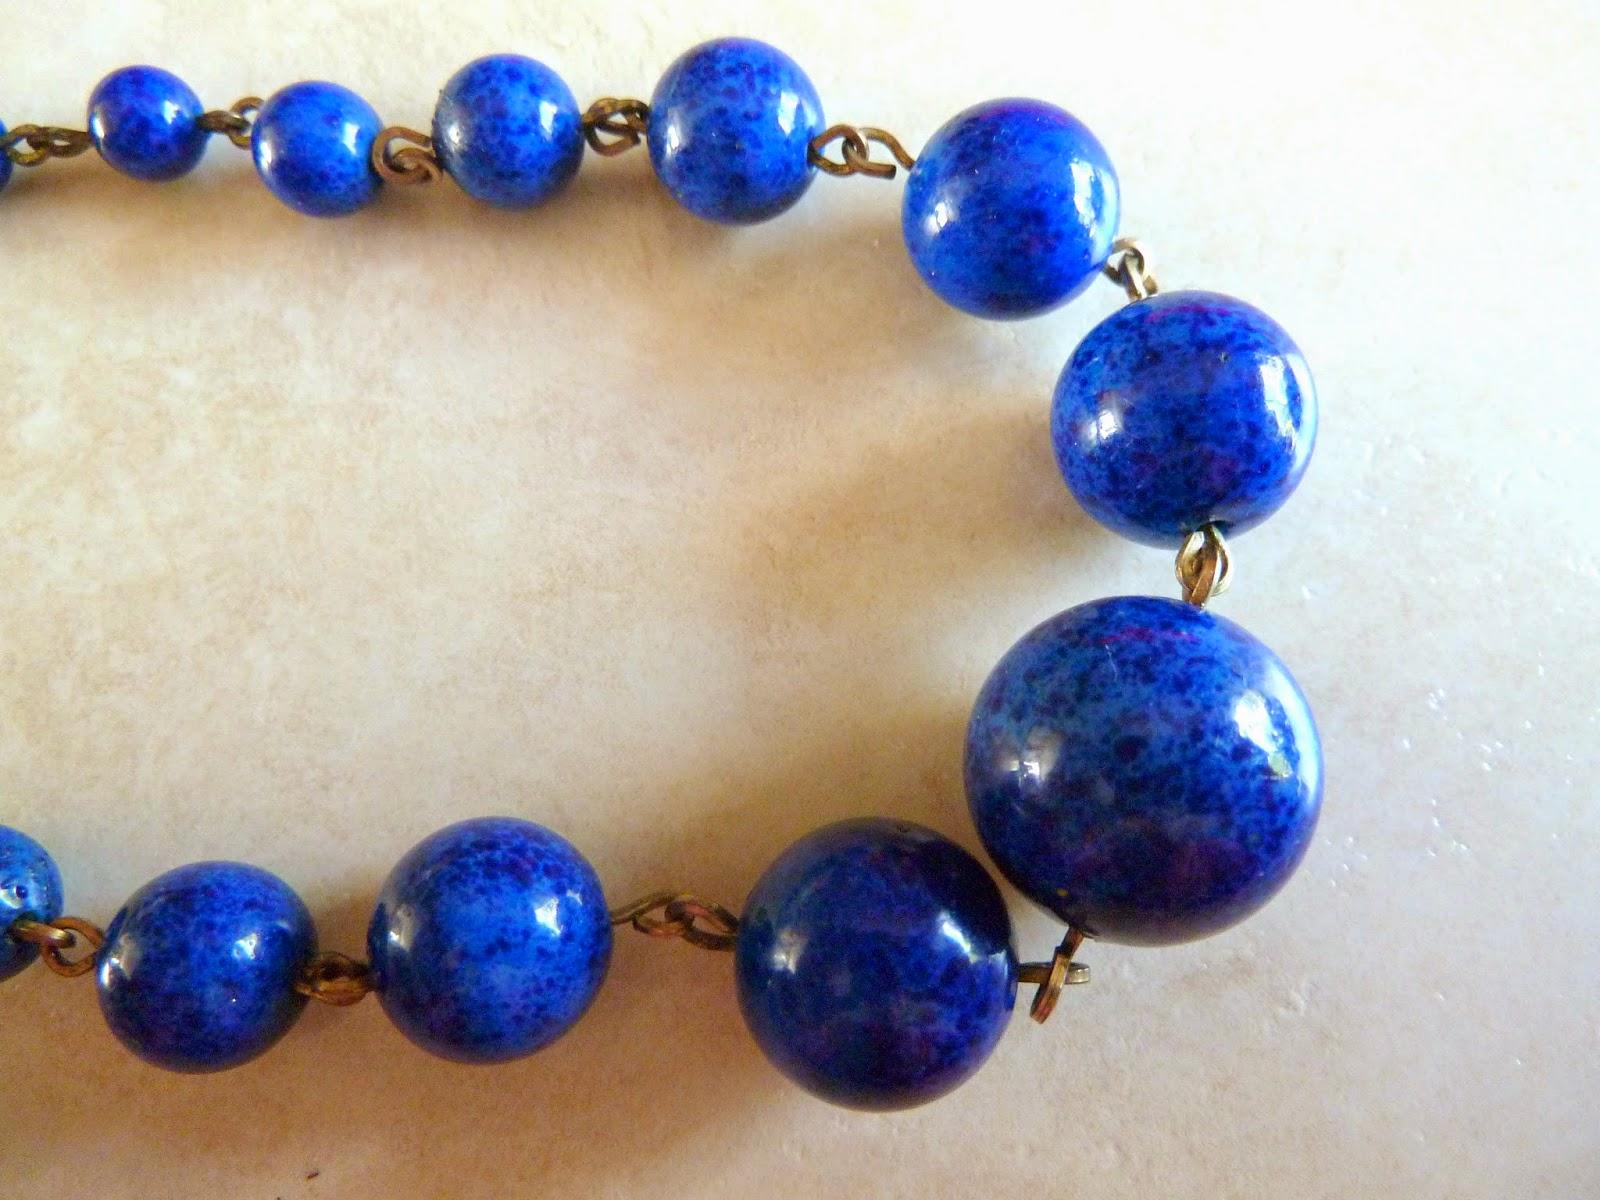 http://www.kcavintagegems.uk/vintage-graduated-blue-glass-bead-necklace-364-p.asp